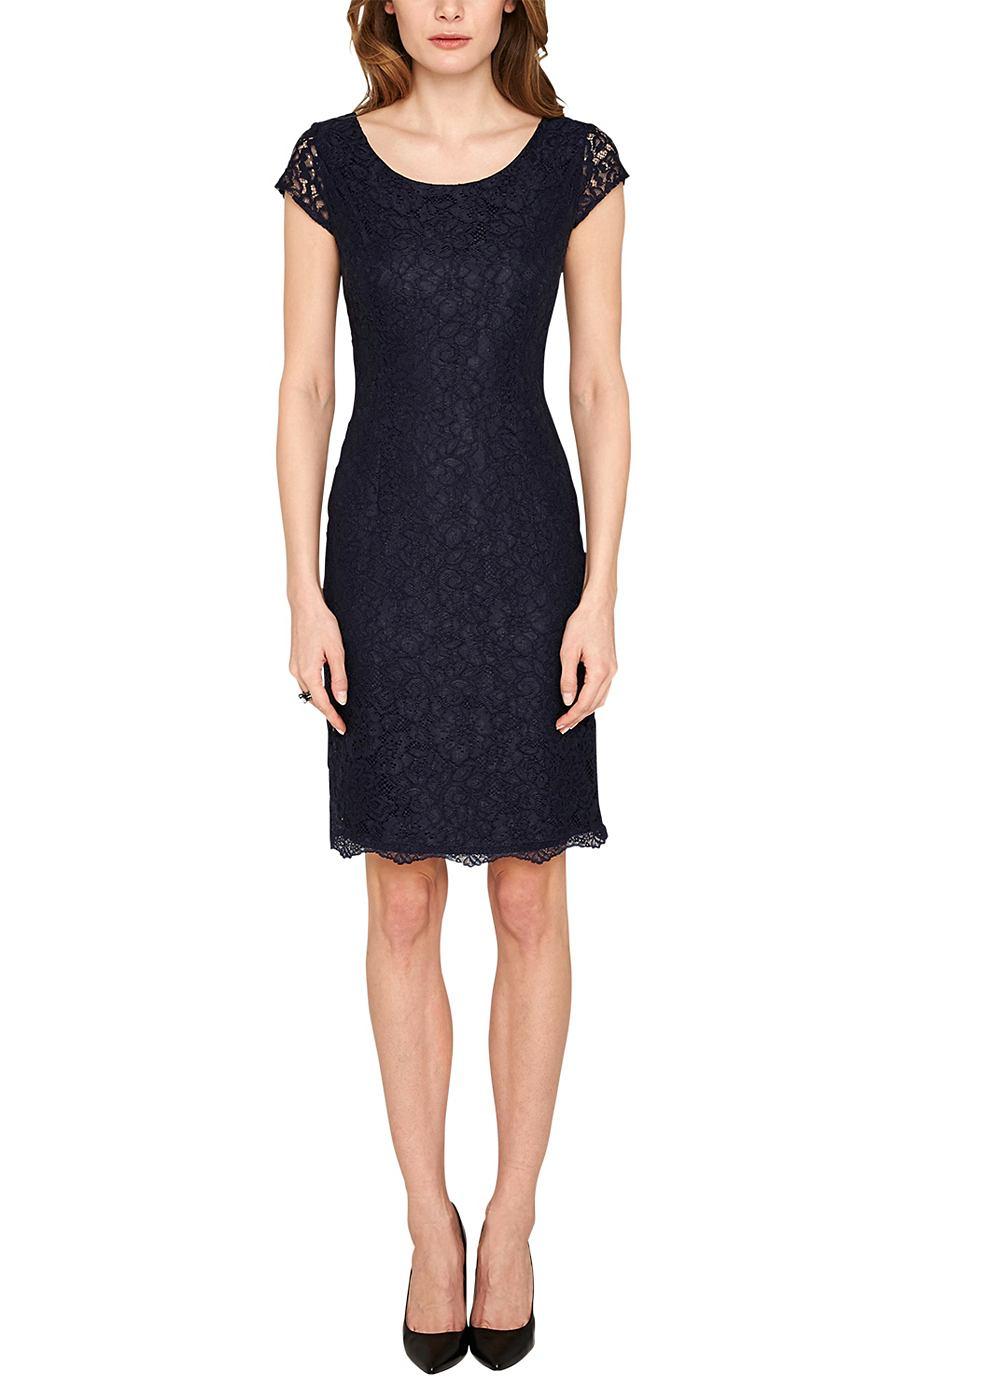 NU 15% KORTING: s.Oliver Premium Accentuerende jurk van kant blauw